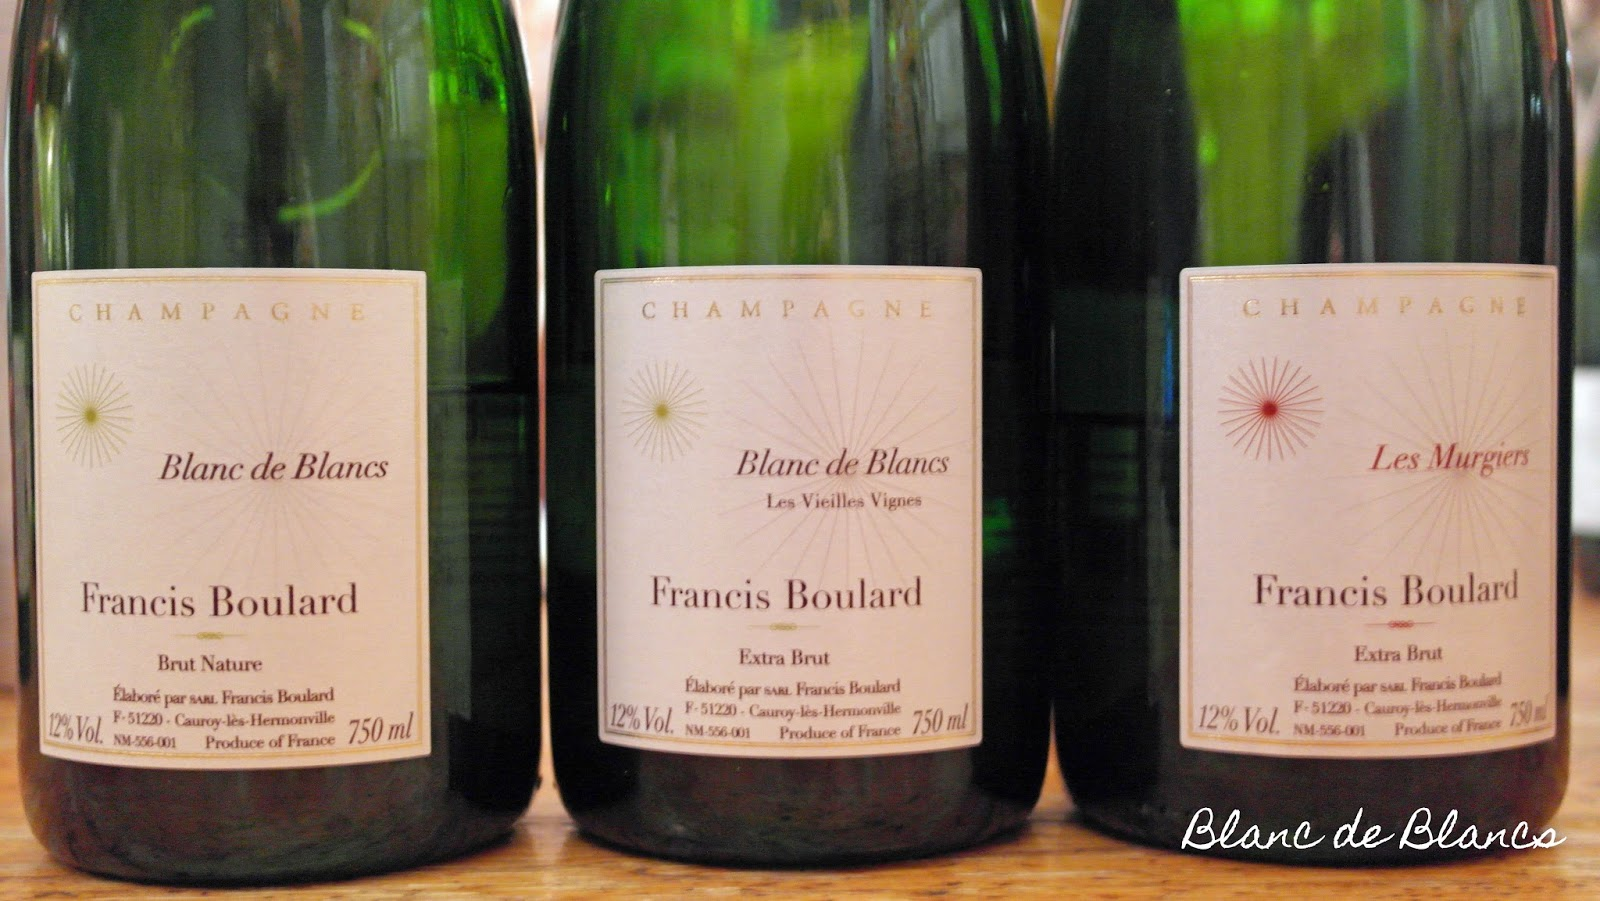 Champagne Francis Boulard - www.blancdeblancs.fi